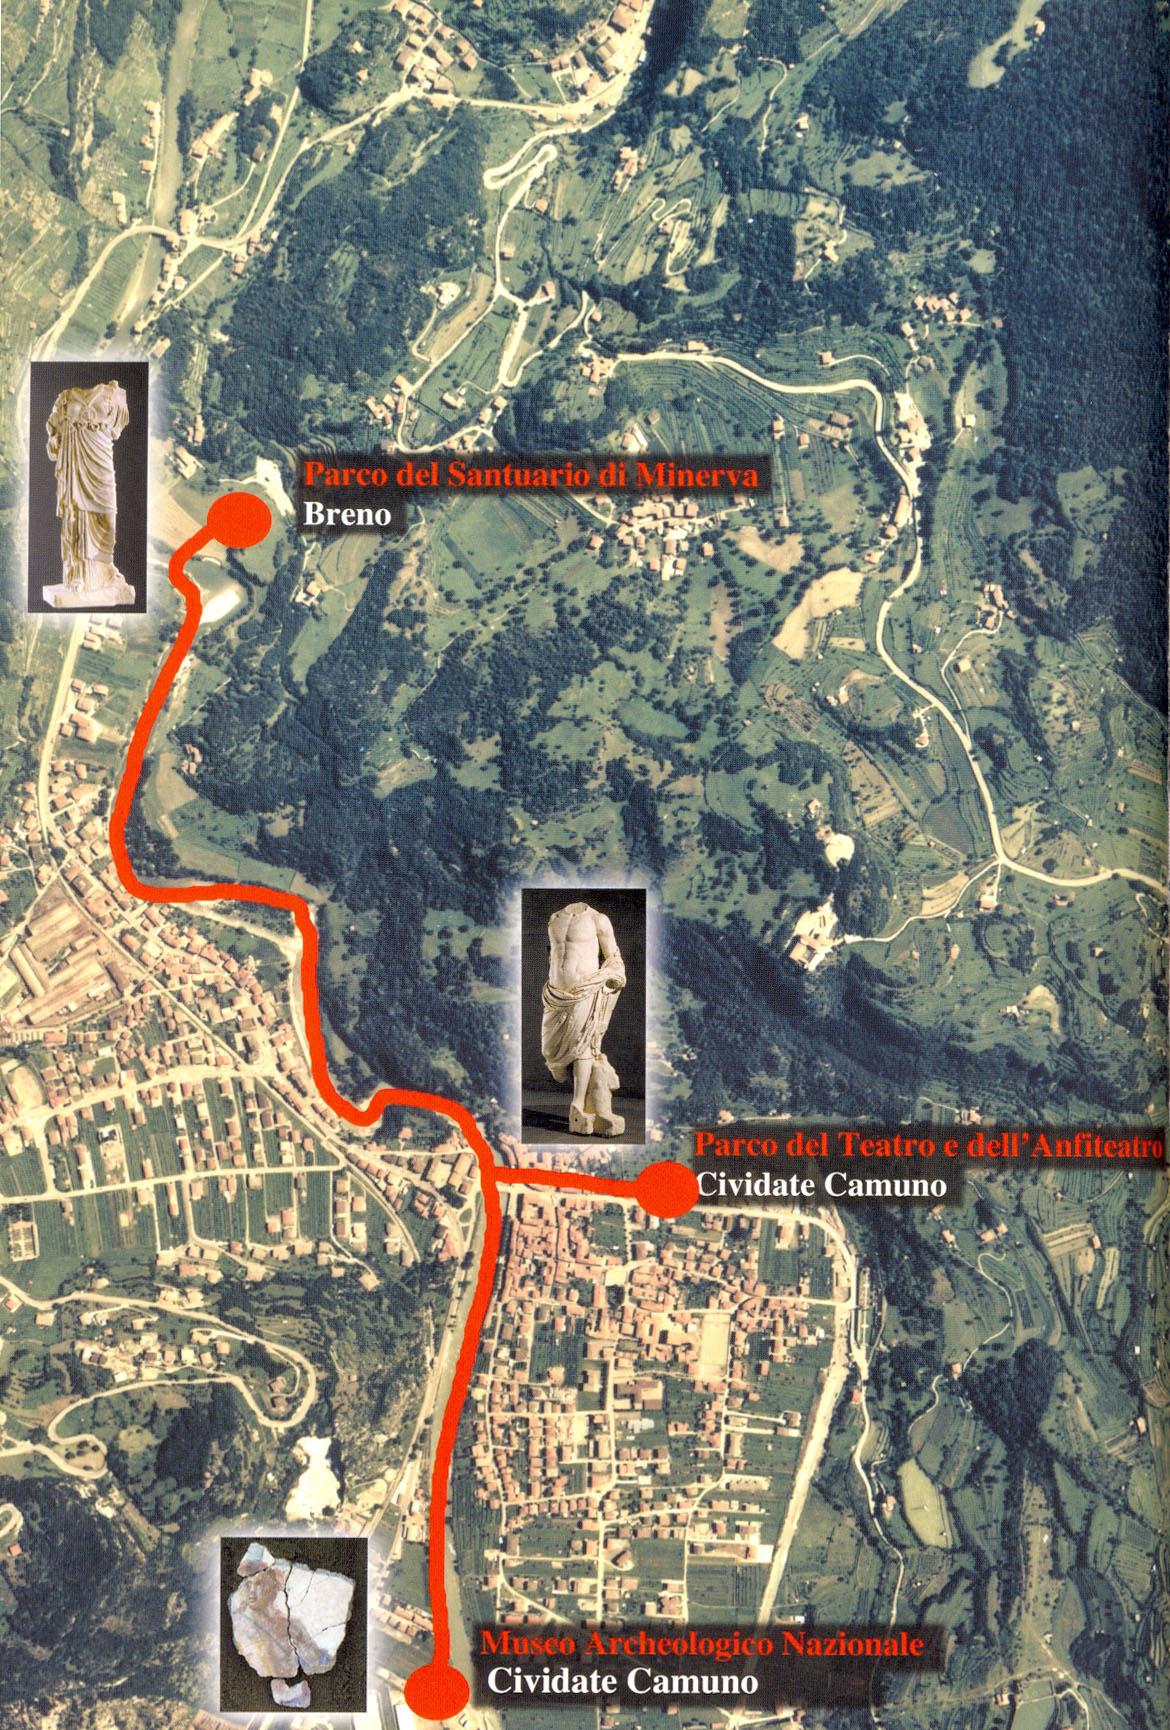 cividate-camuno_itinerari-archeologici-dal-museo_foto-drm-lombardia